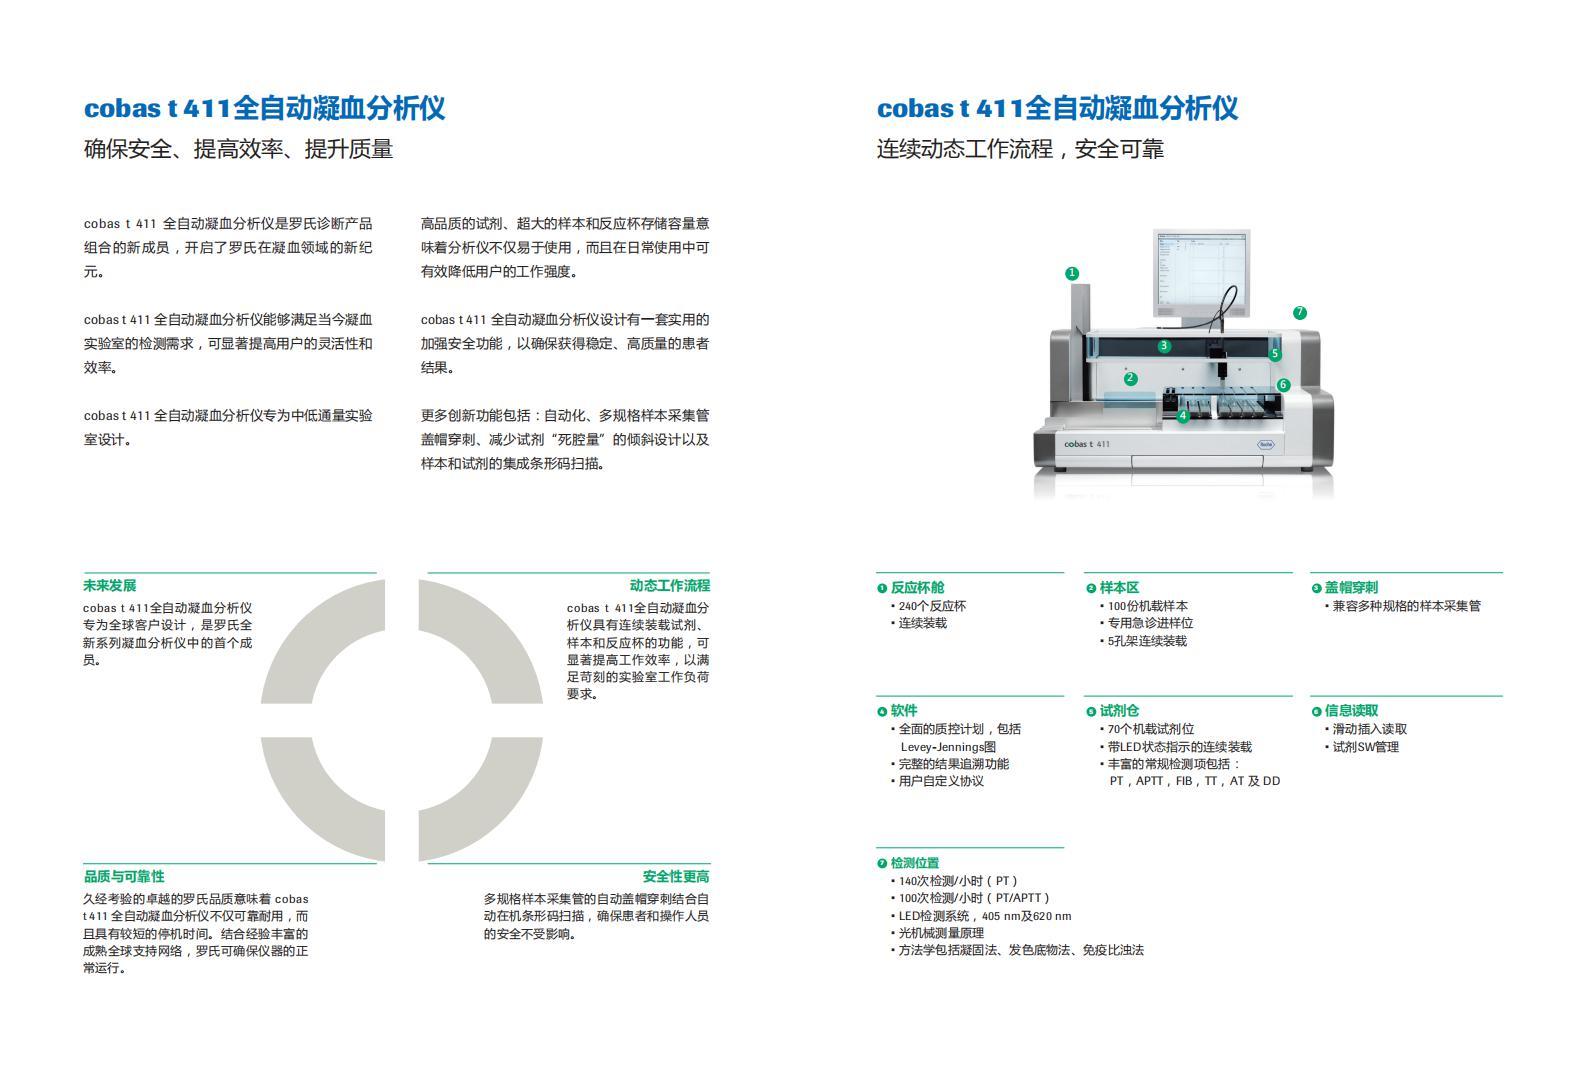 MC-CN-00403 cobas t 411全自动凝血分析仪彩页-2020020434_01.jpg